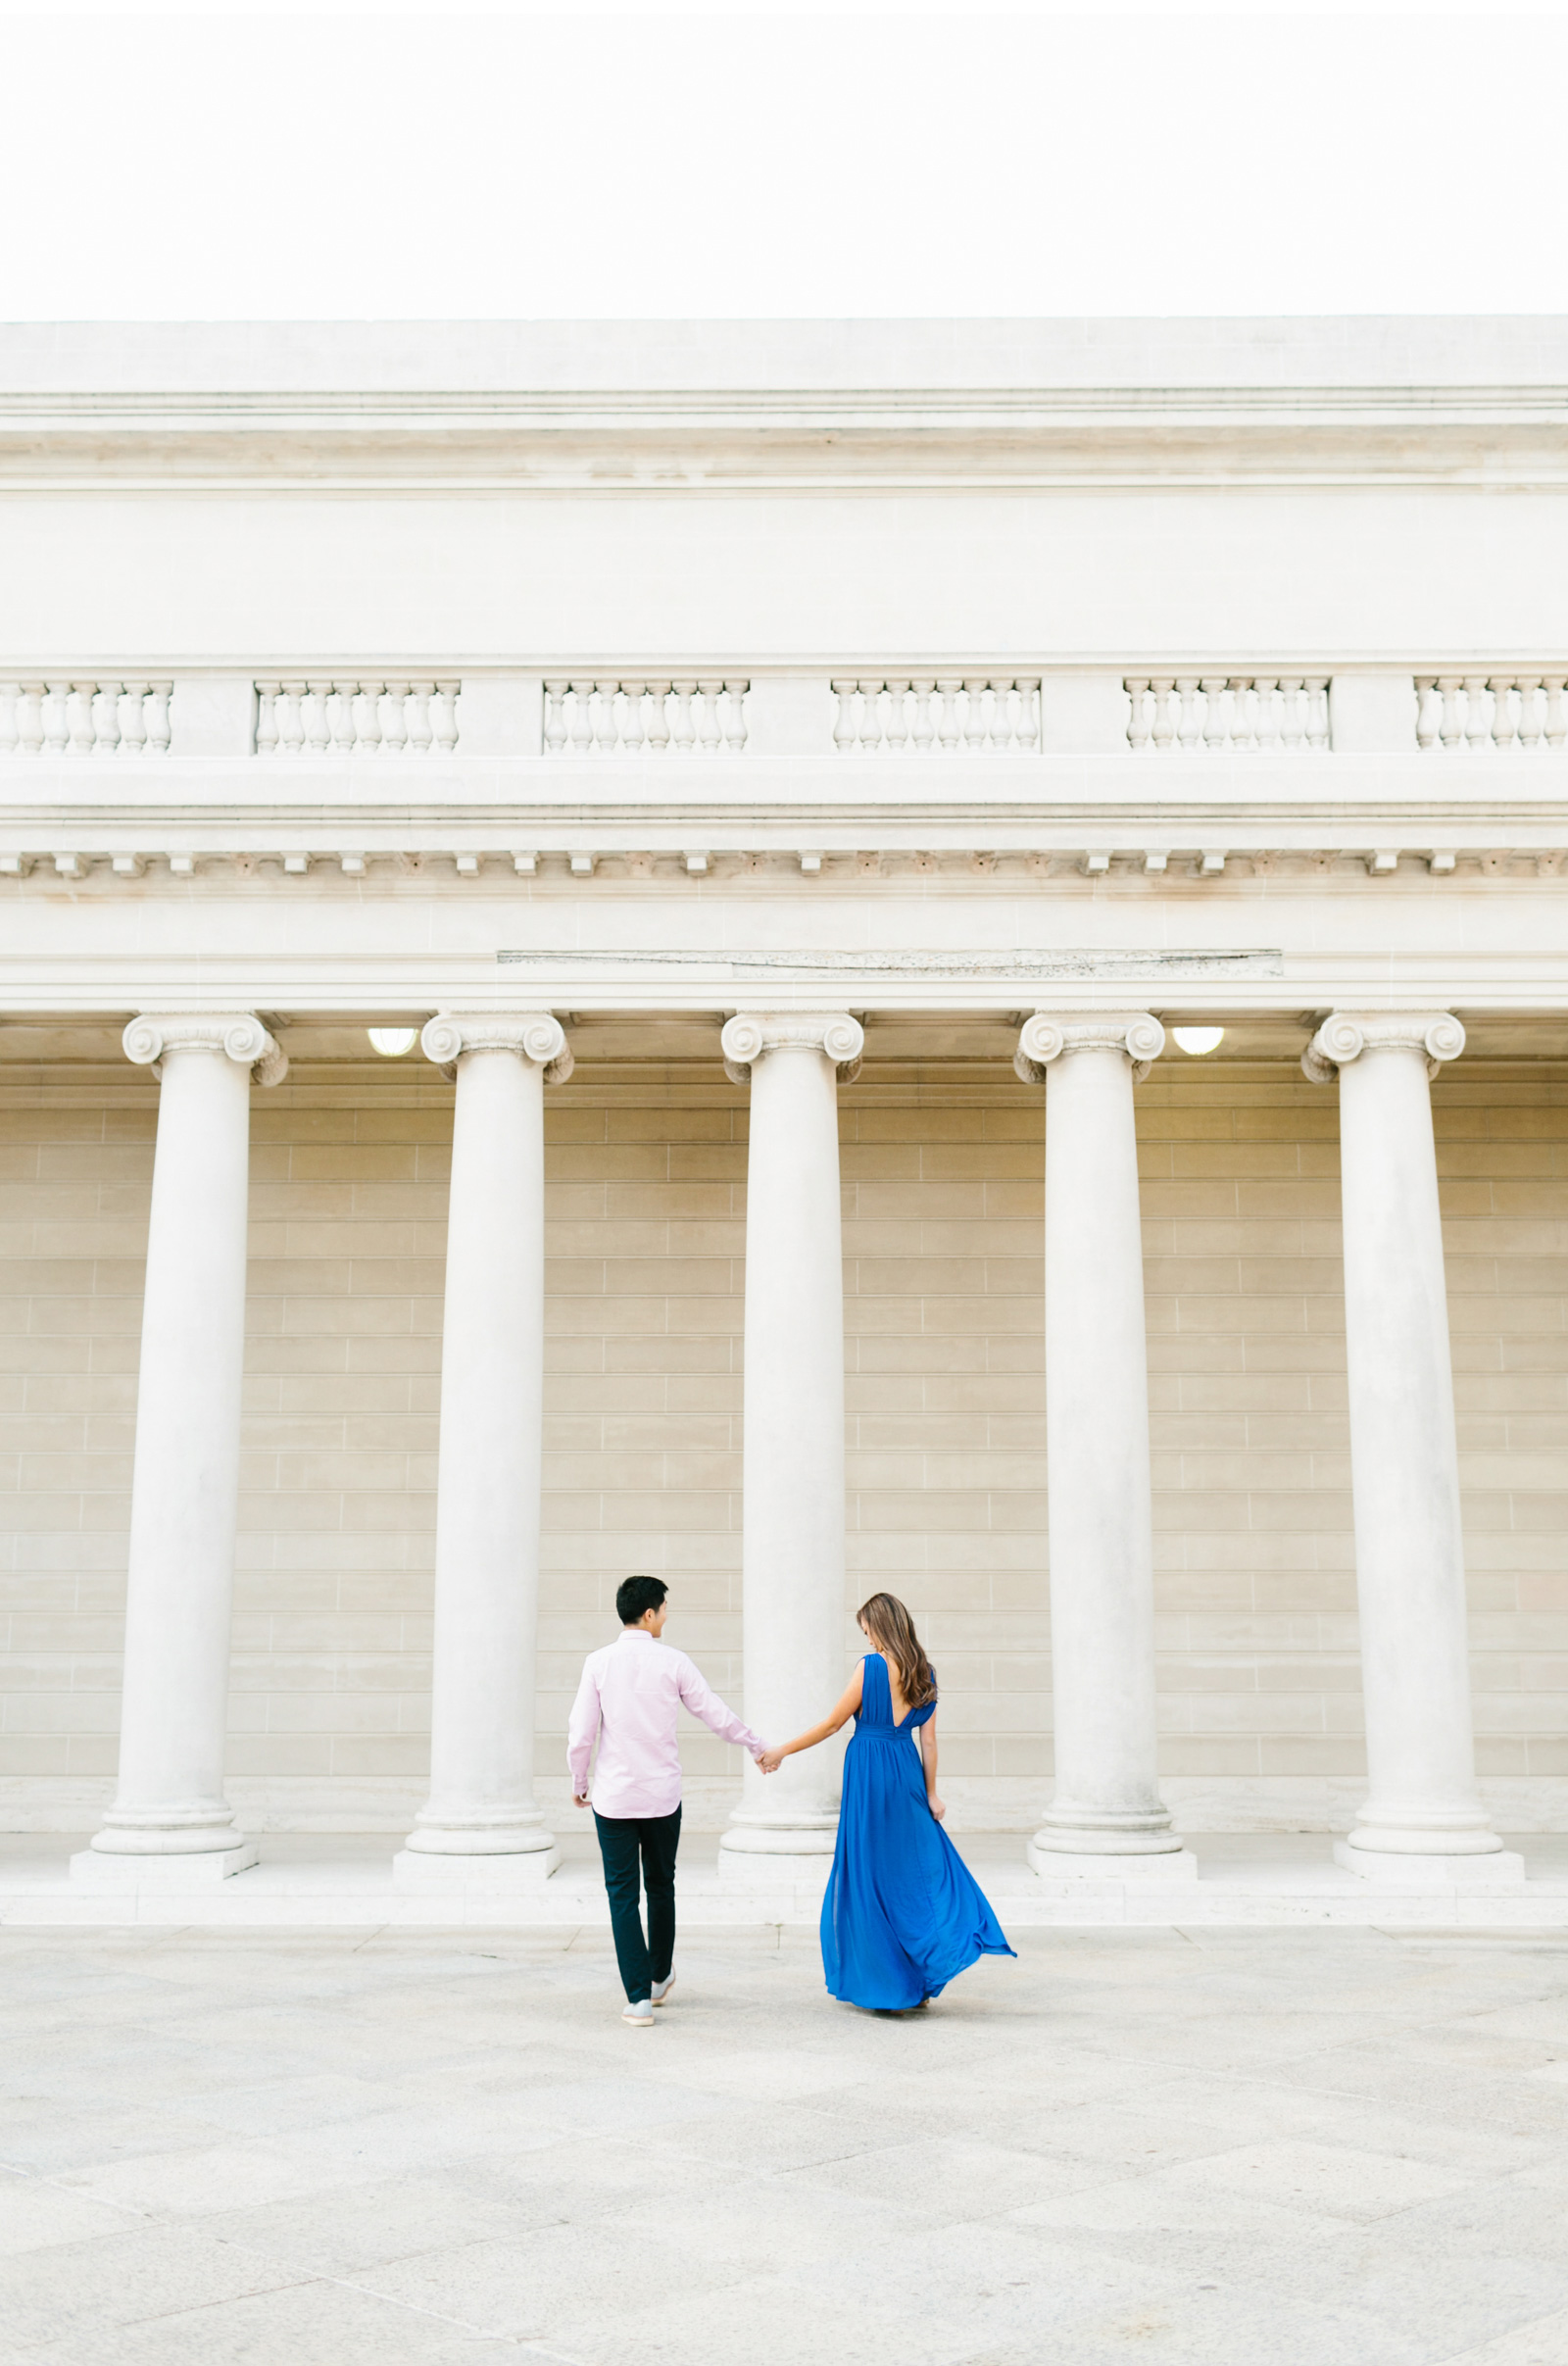 Malibu-Wedding-Venues-Natalie-Schutt-Photography-Style-Me-Pretty-Top-Weddings_16.jpg